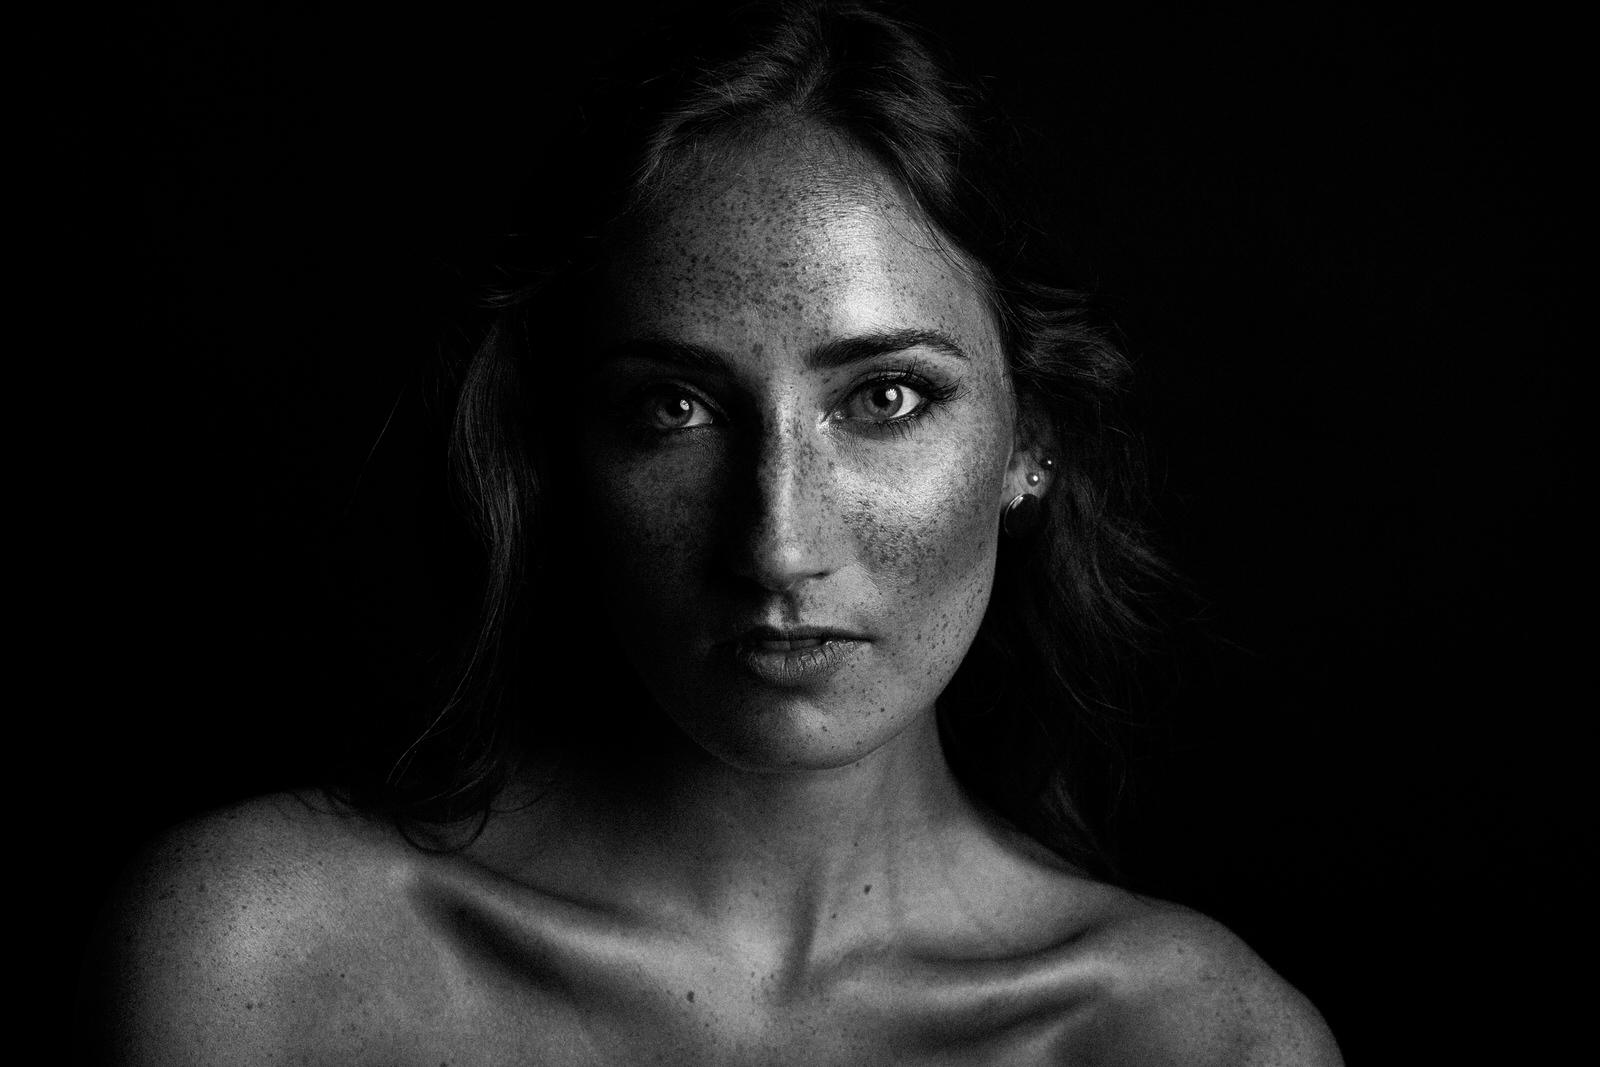 06242017_Julia_Faces.jpg